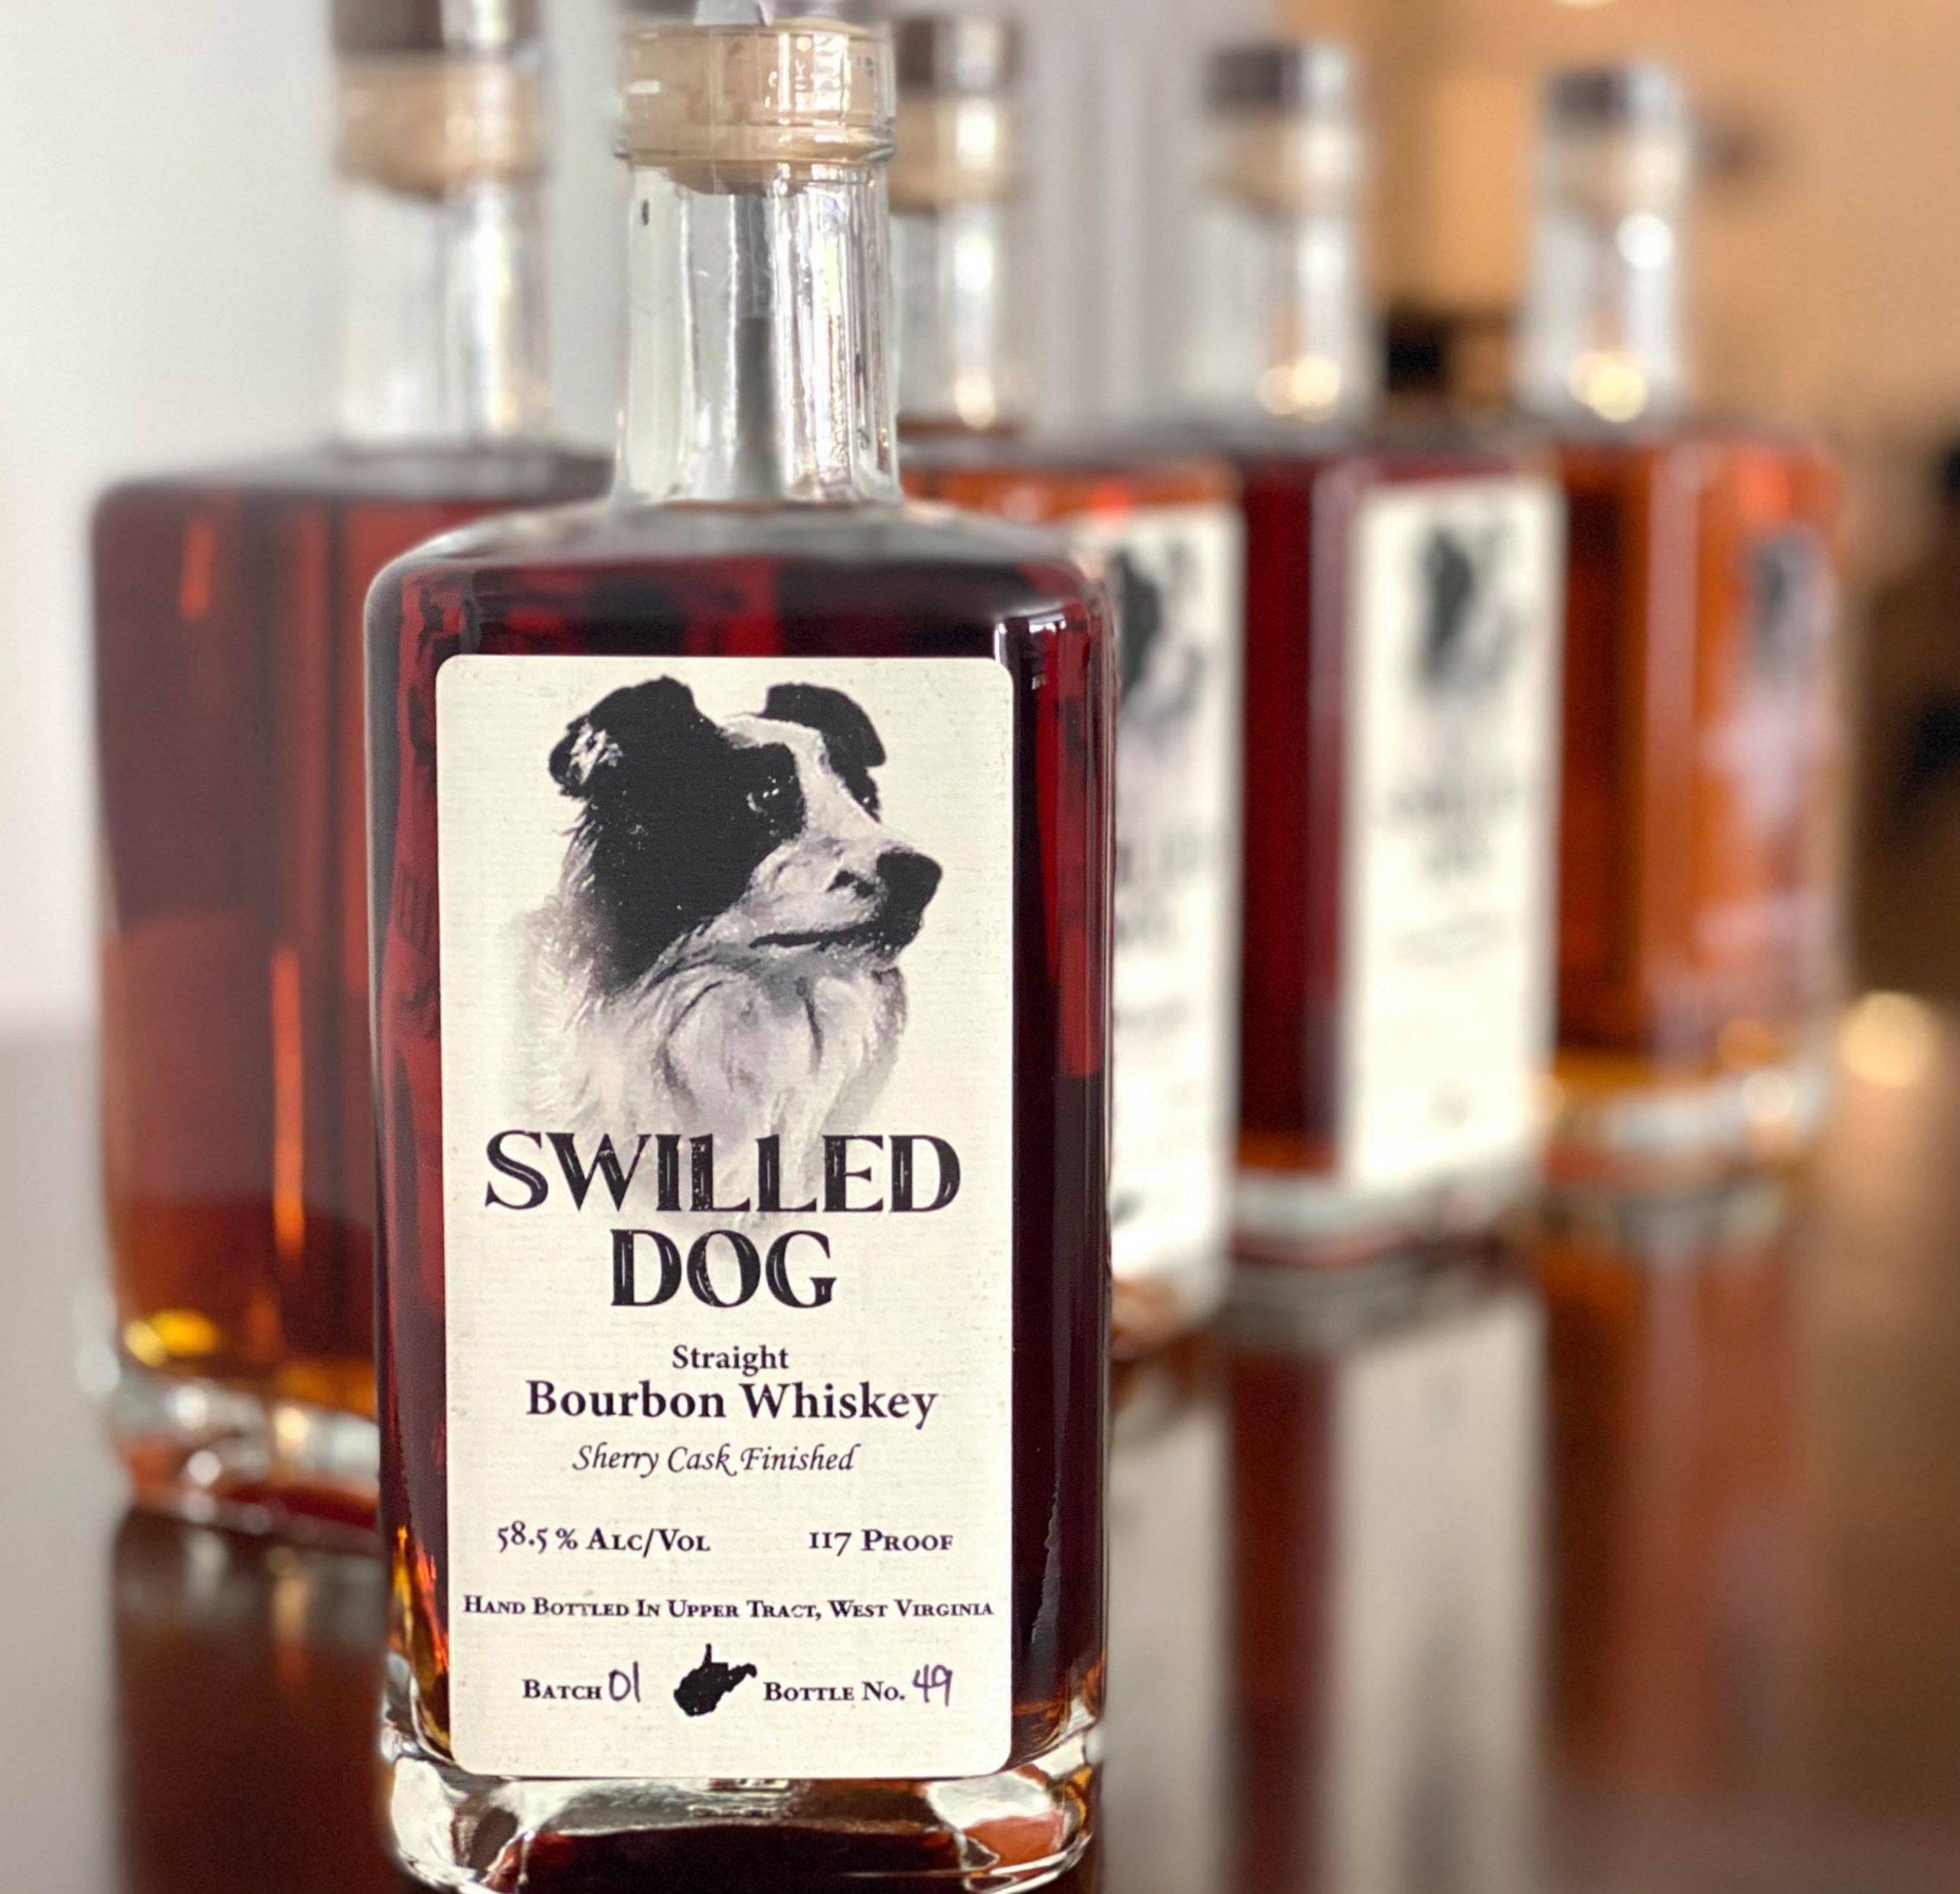 Swilled Dog Barrel Strength Sherry Cask Finished Bourbon